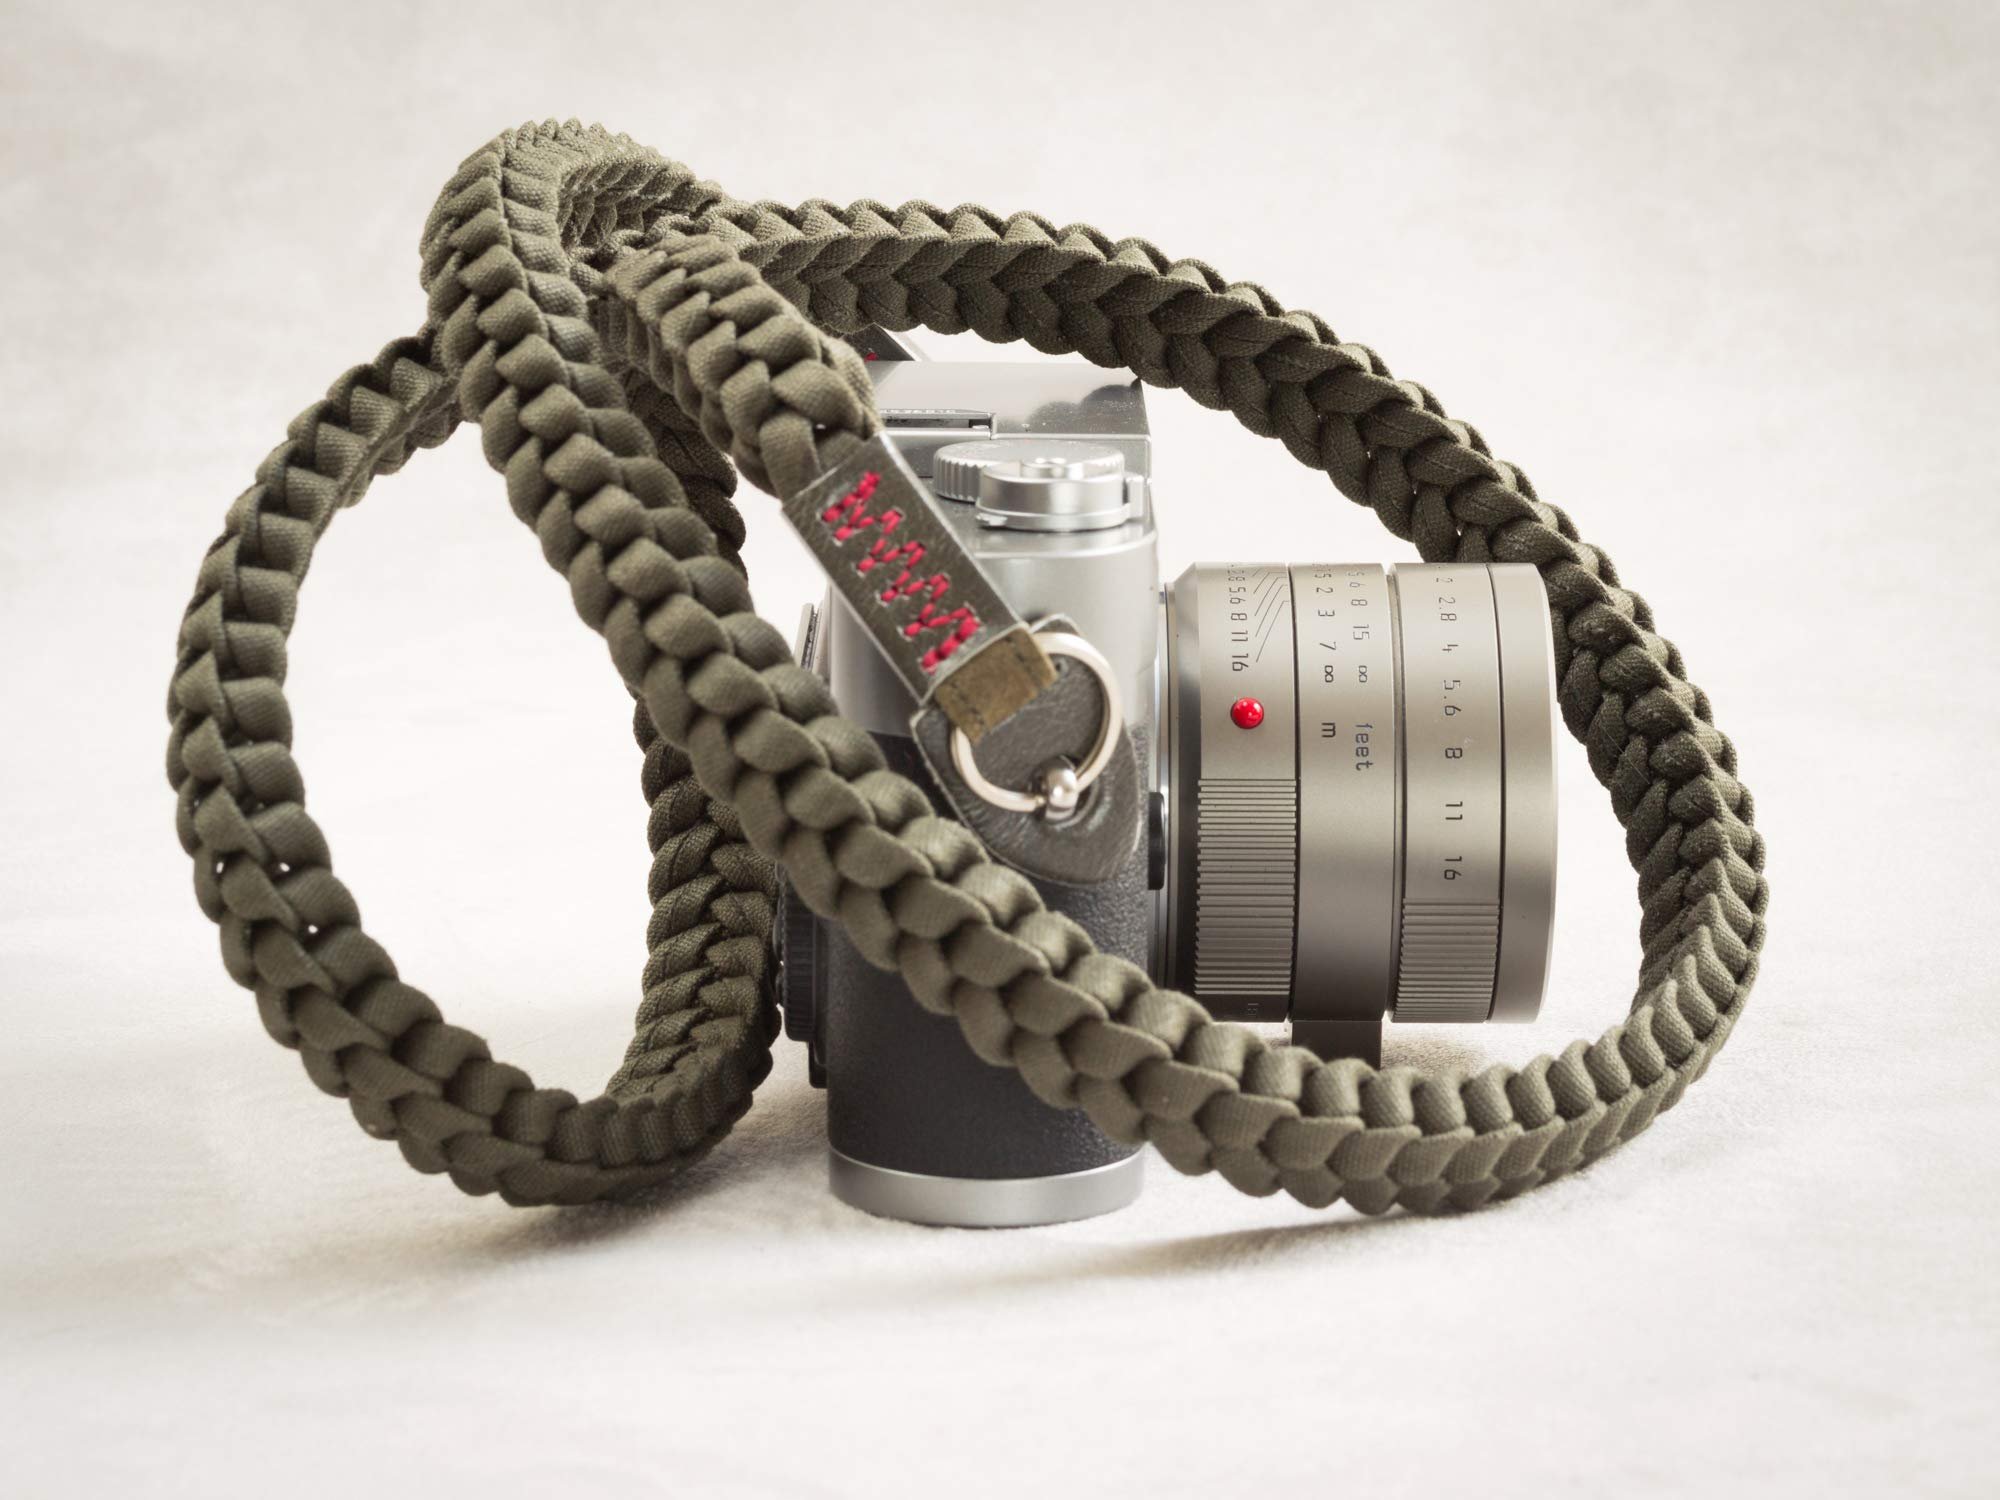 Barton 1972 Designer Braided Muddy Green Military Camera Neck Strap Lint Free Cotton 42'' Long w/Carry Bag Leica Sony Fuji Olympus Nikon by Barton 1972 (Image #3)